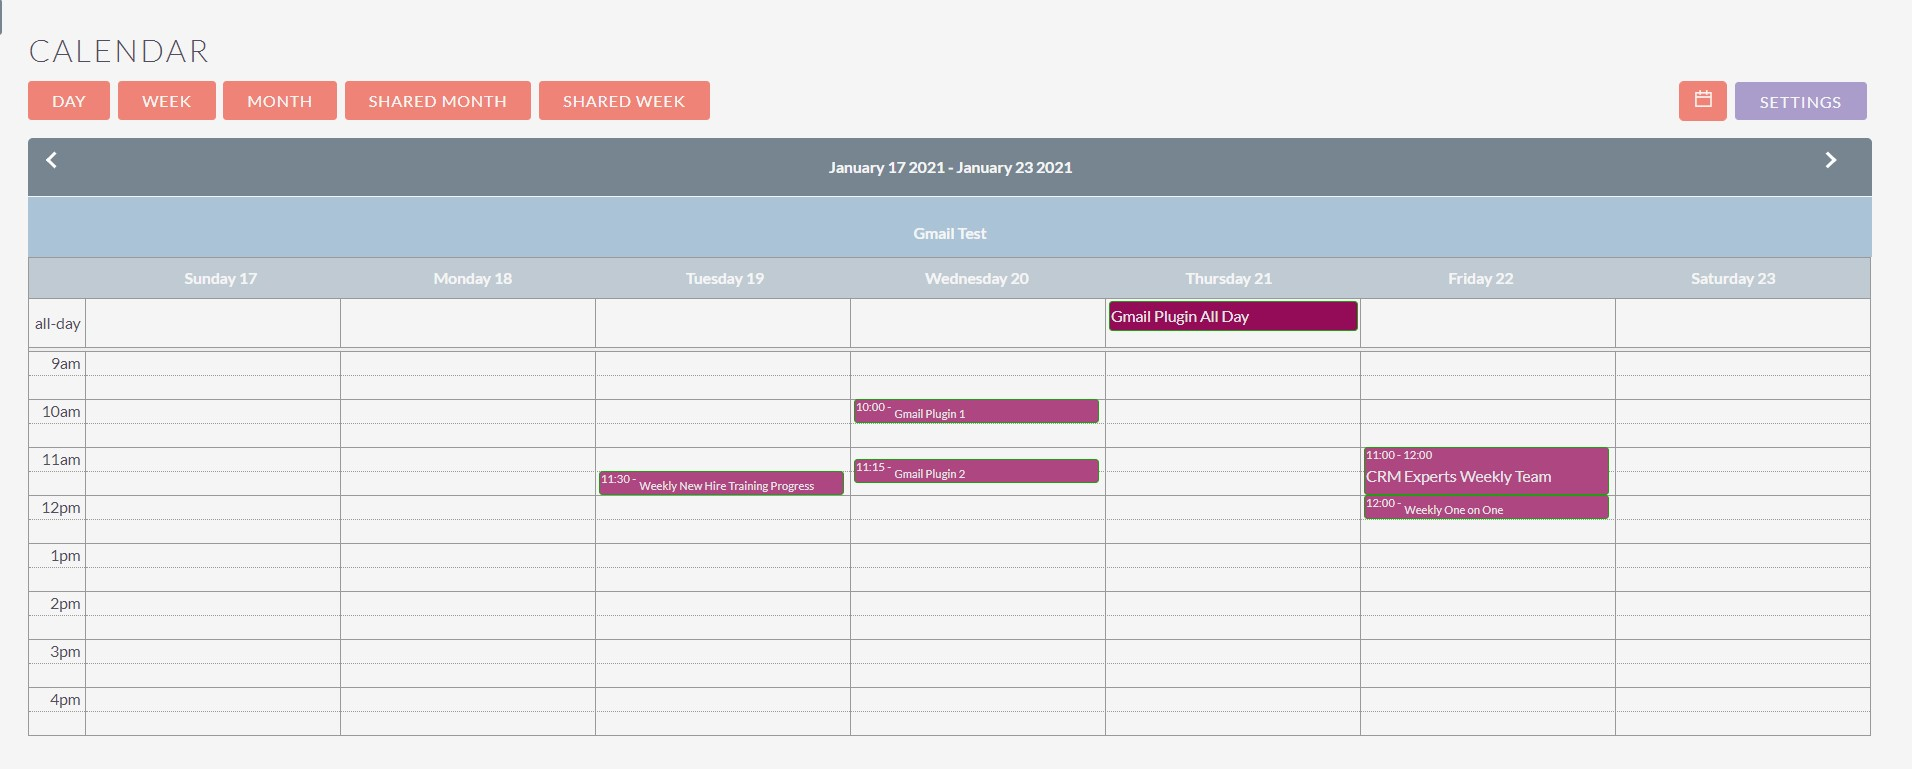 Gmail Ninja for SuiteCRM view calendar